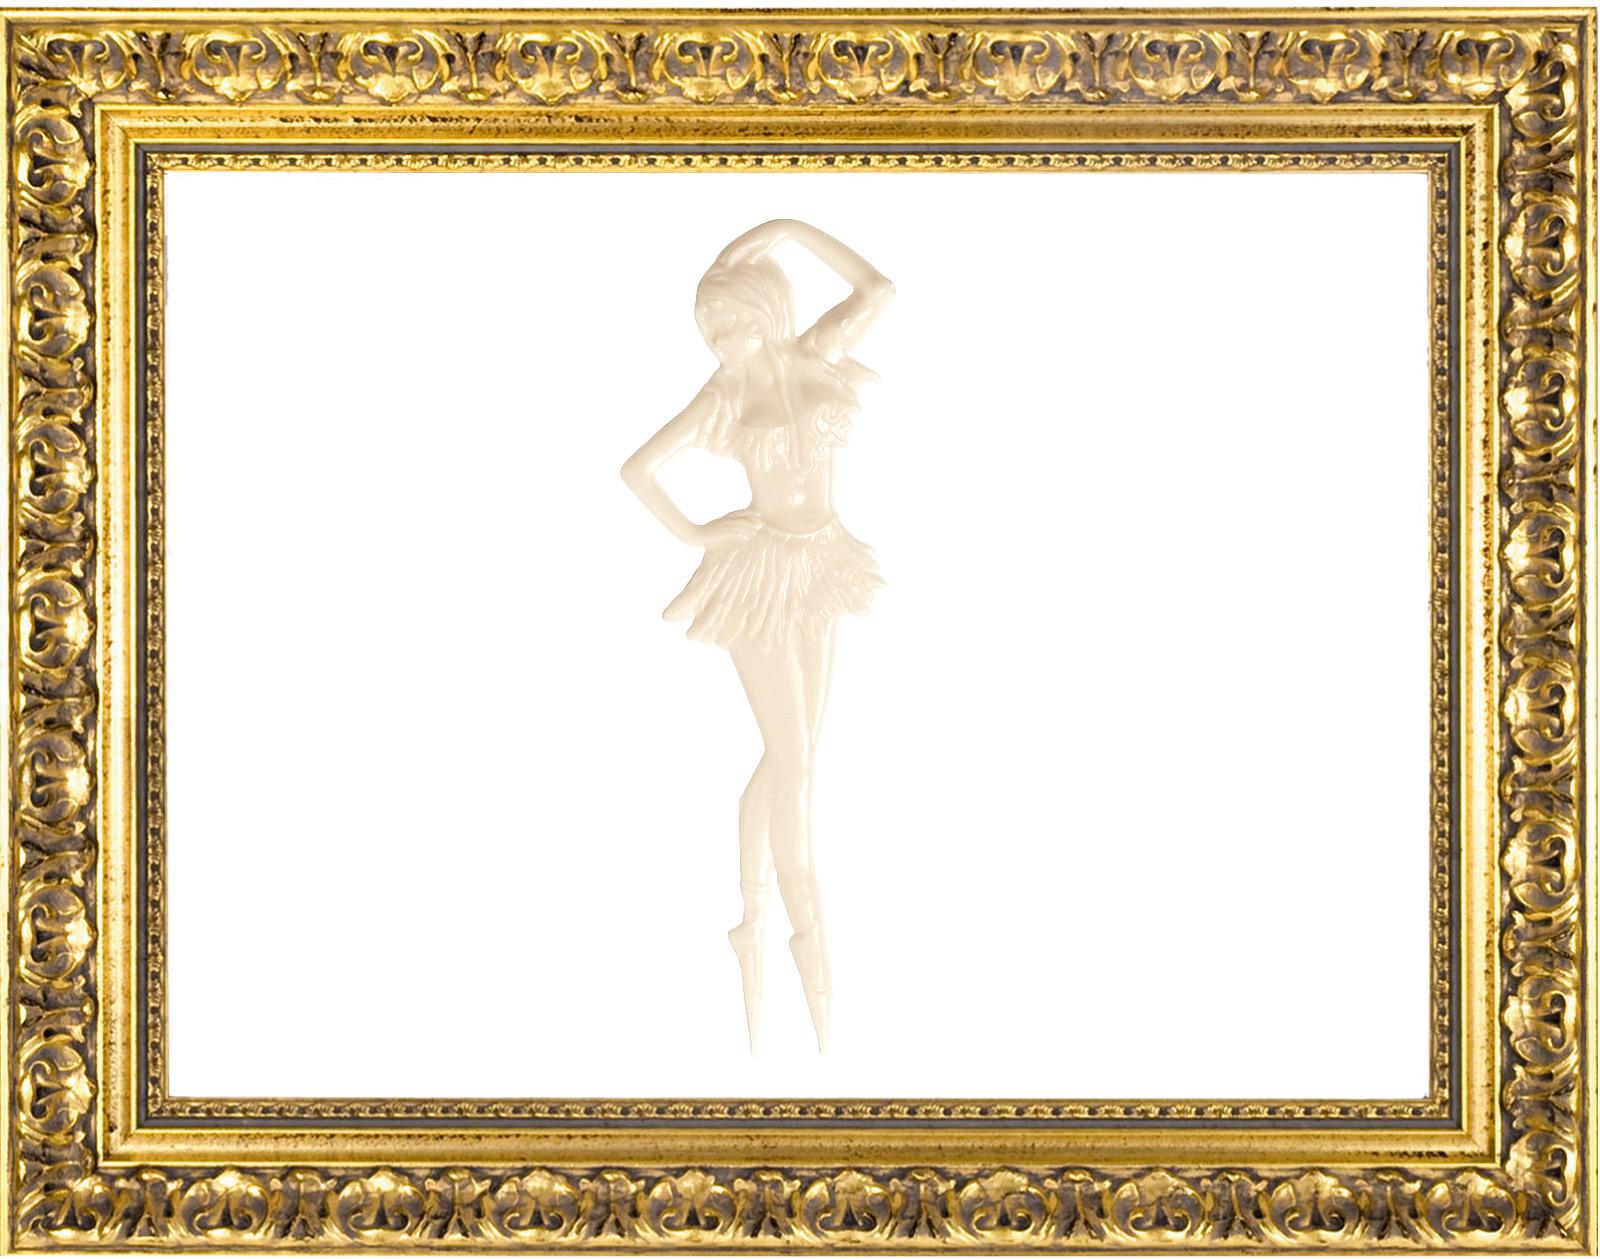 Ballerina stilizzata